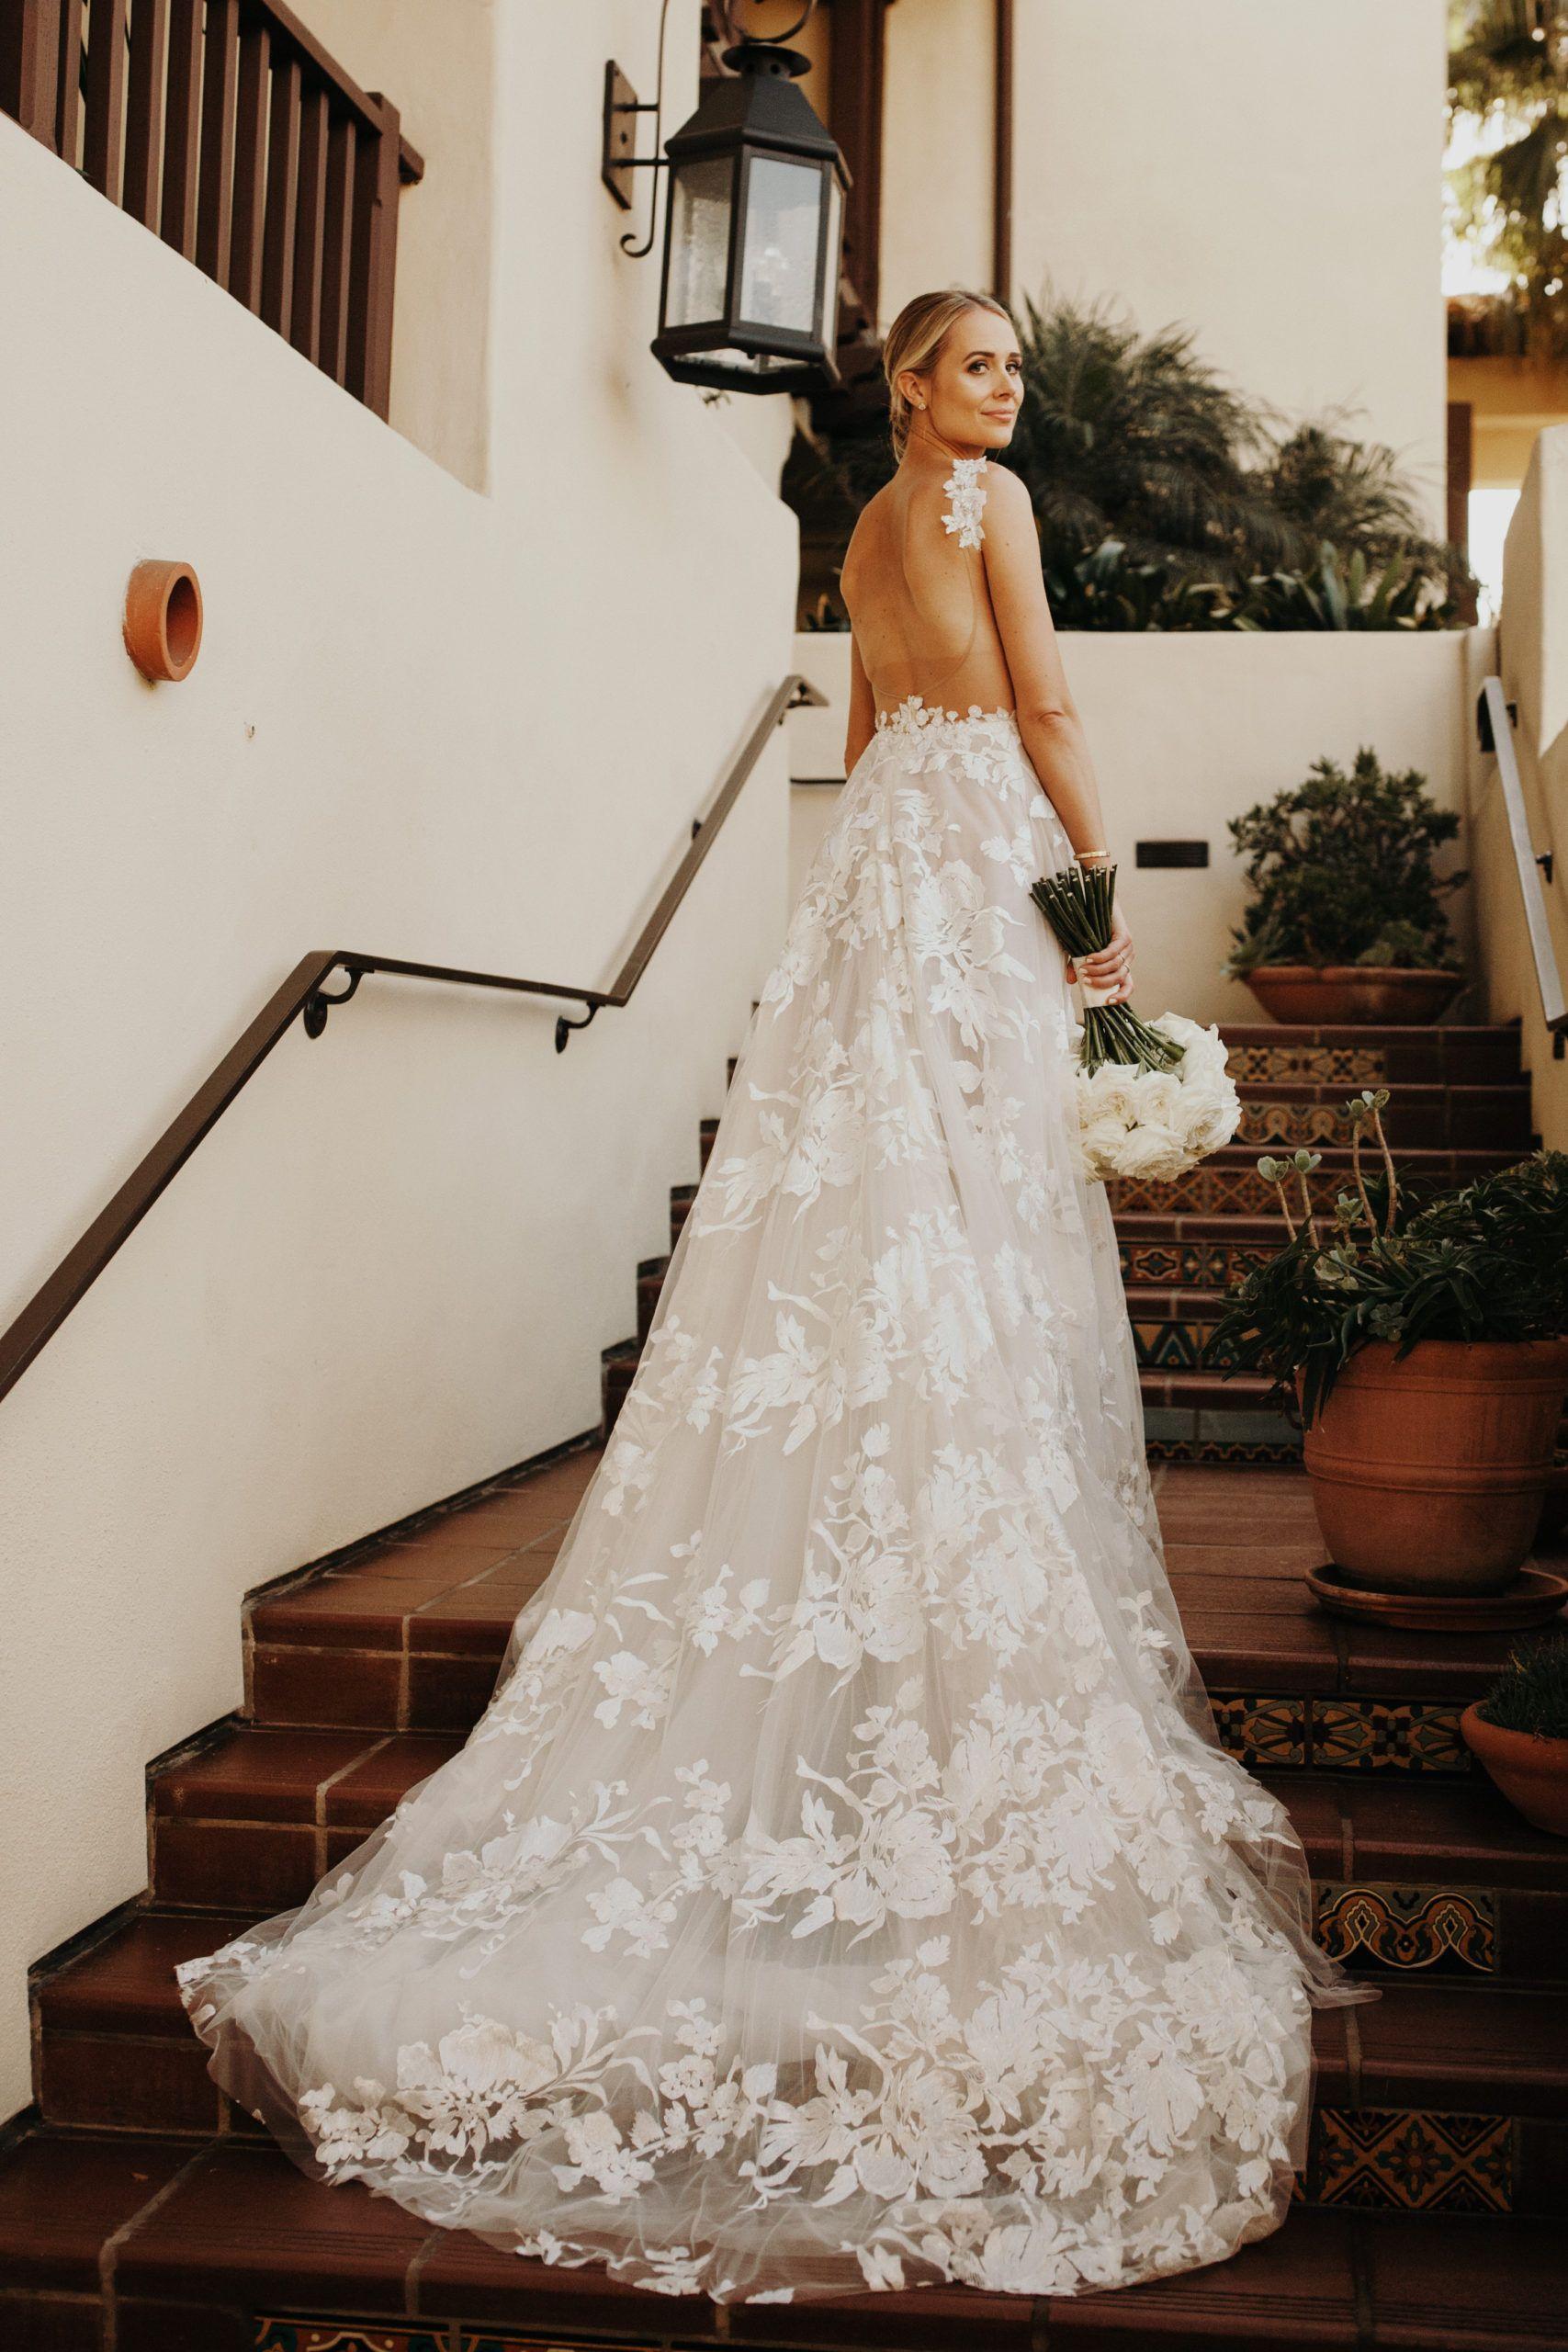 Outdoor Wedding California Wedding Southern California Wedding Wedding Dress Summer Wedding Bridal Dresses Wedding Rehearsal Outfit Fashion Jackson [ 2560 x 1707 Pixel ]